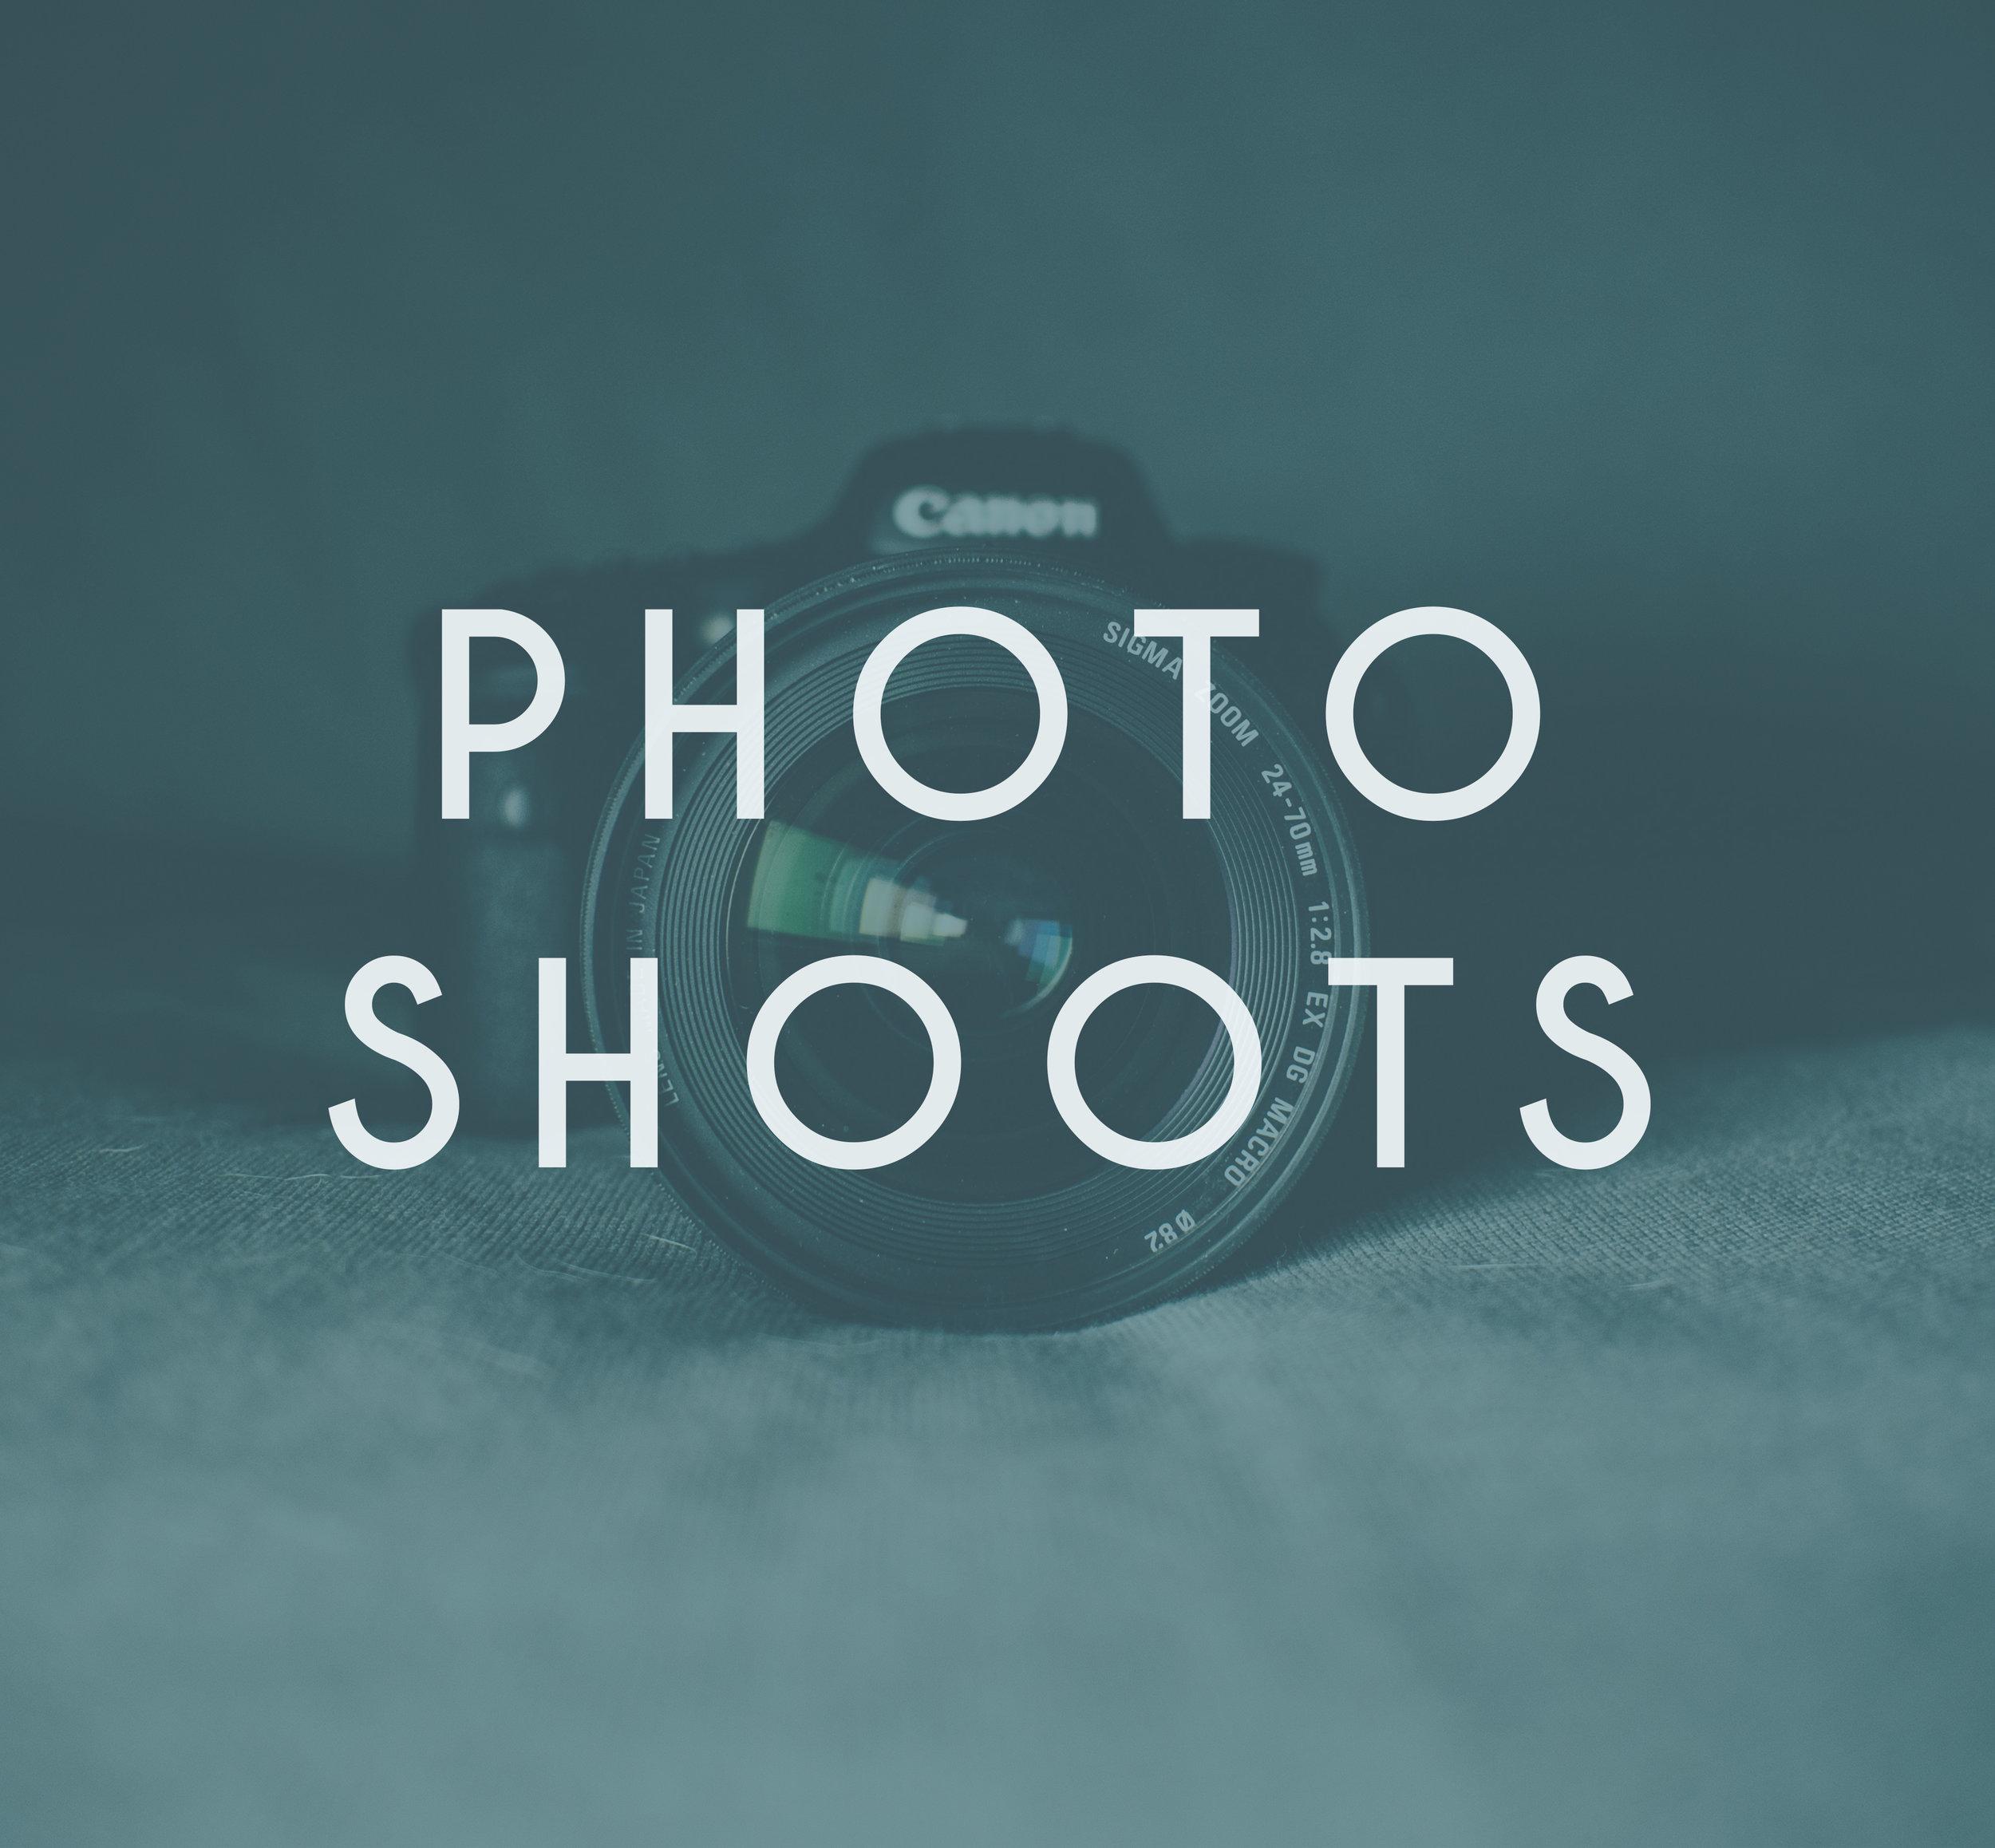 PhotoShoots.jpg